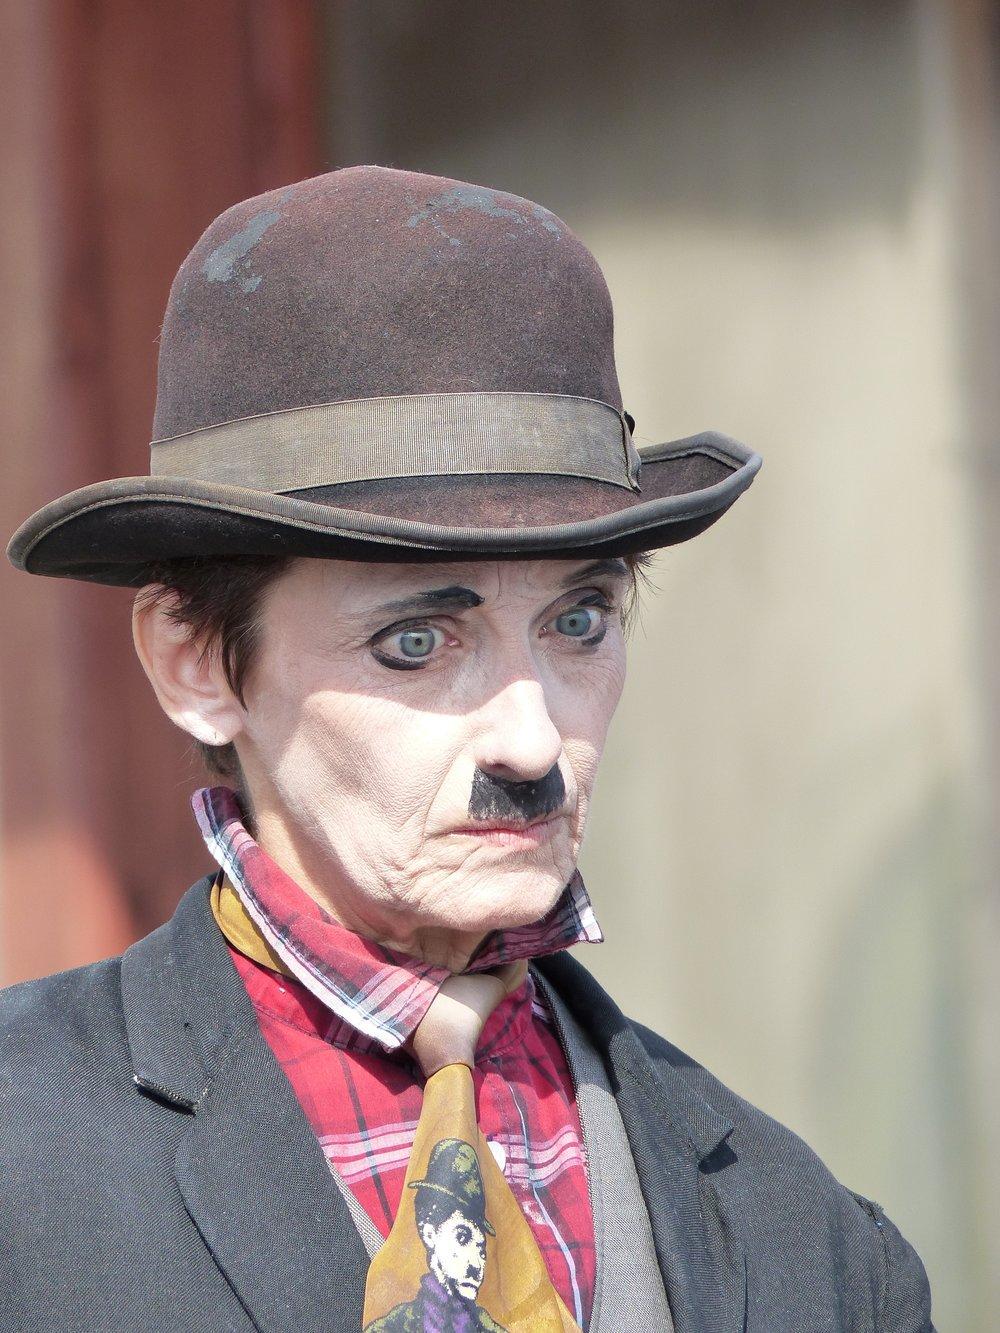 beard-charlie-chaplin-circus-34111.jpg